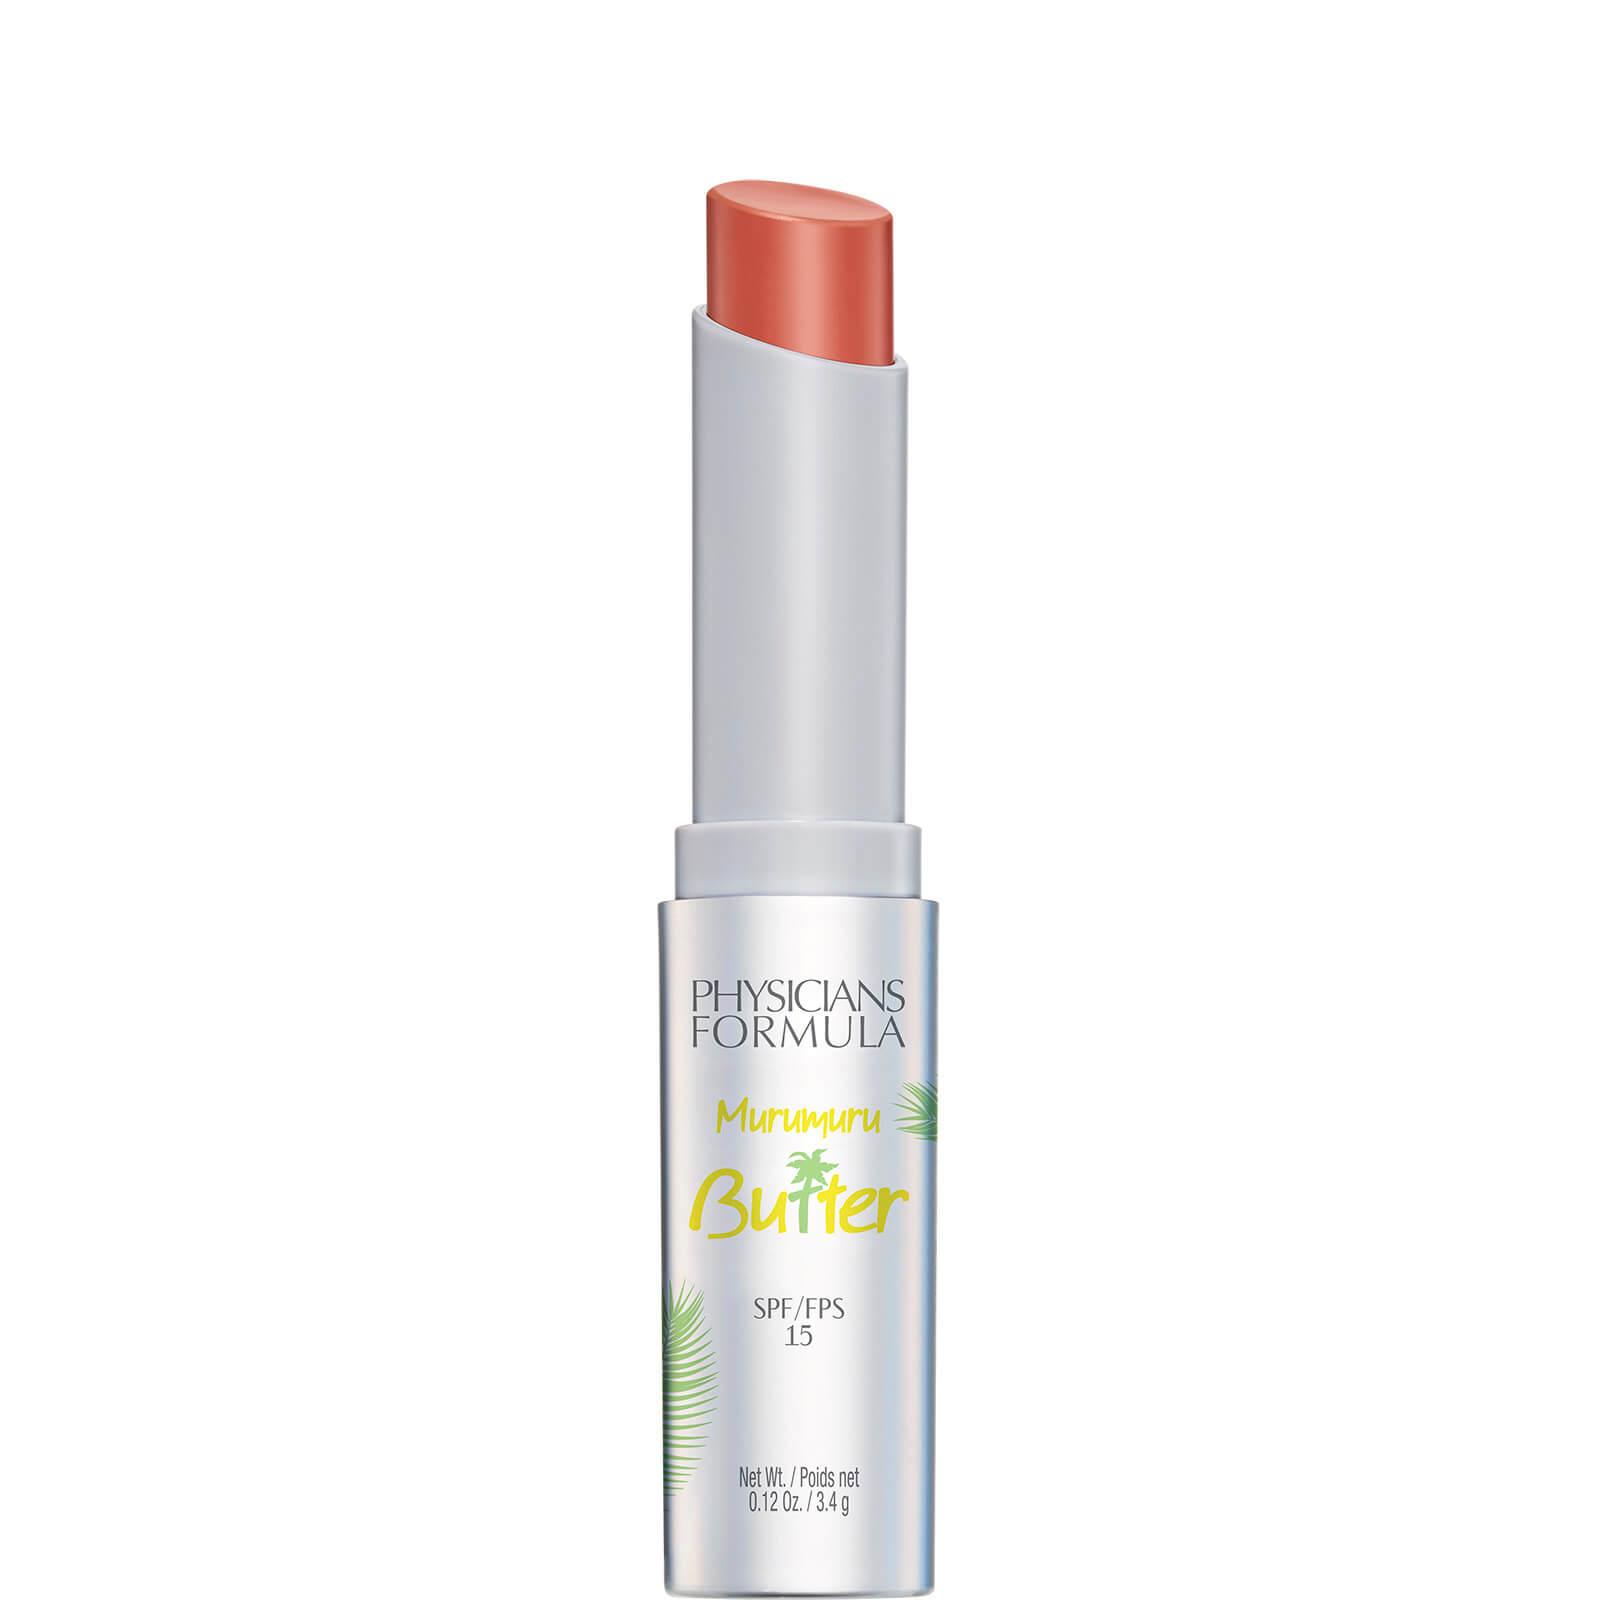 Купить Physicians Formula Murumuru Butter Lip Cream SPF15 3.4g (Various Shades) - Brazilian Sunset